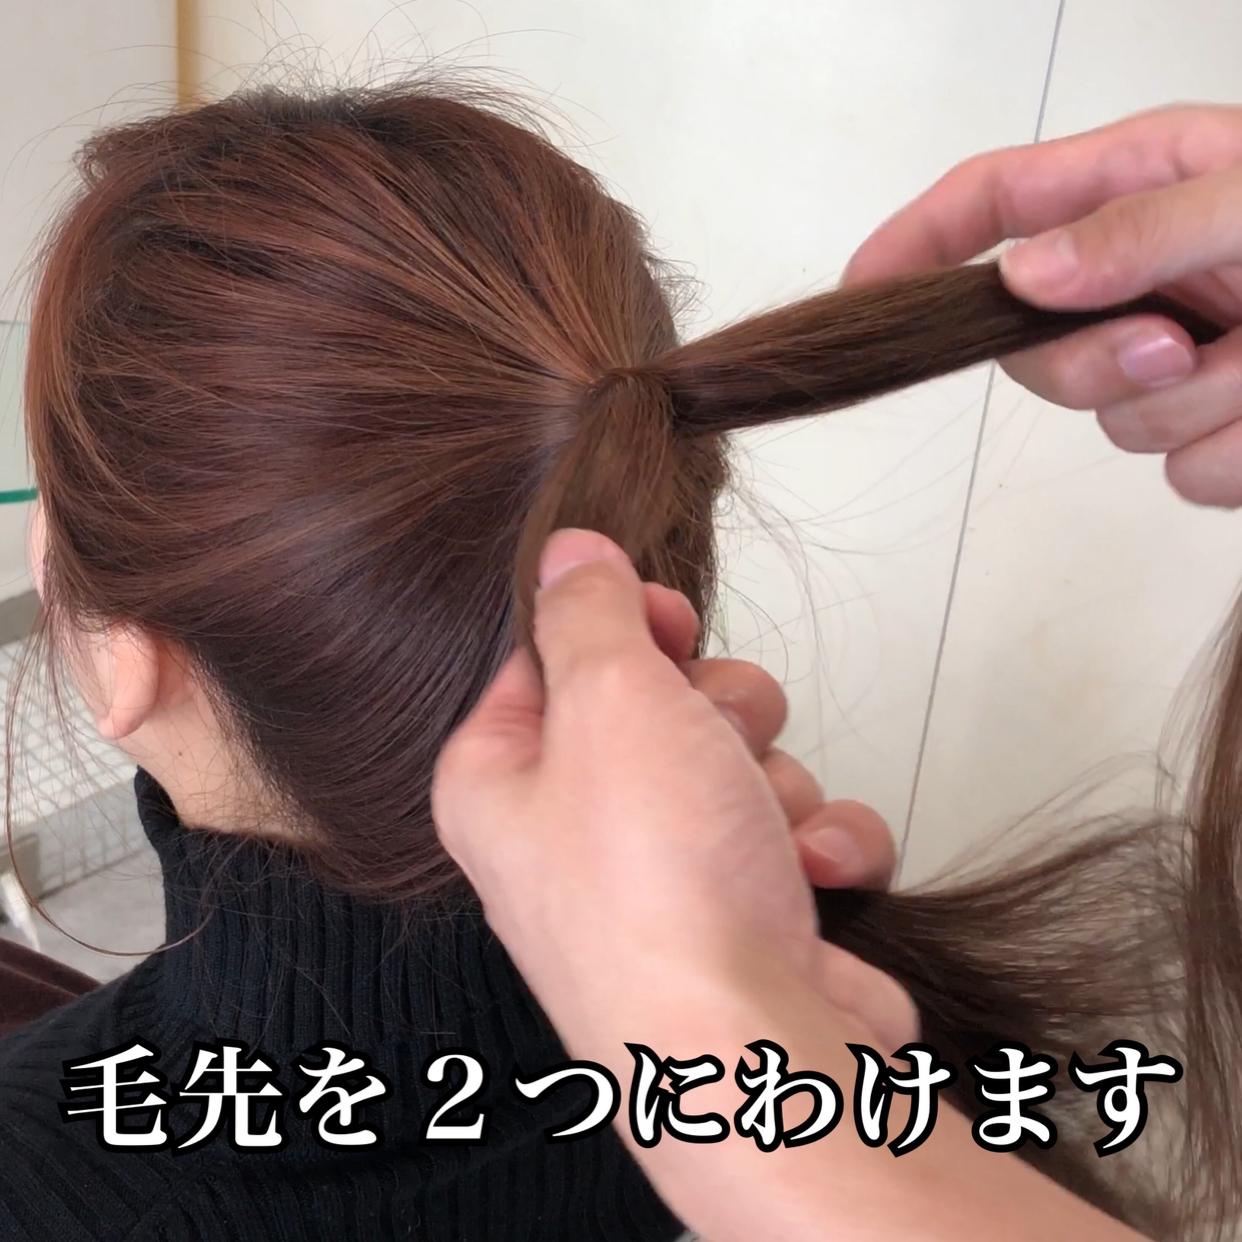 kawamura_takashi_camが投稿した画像